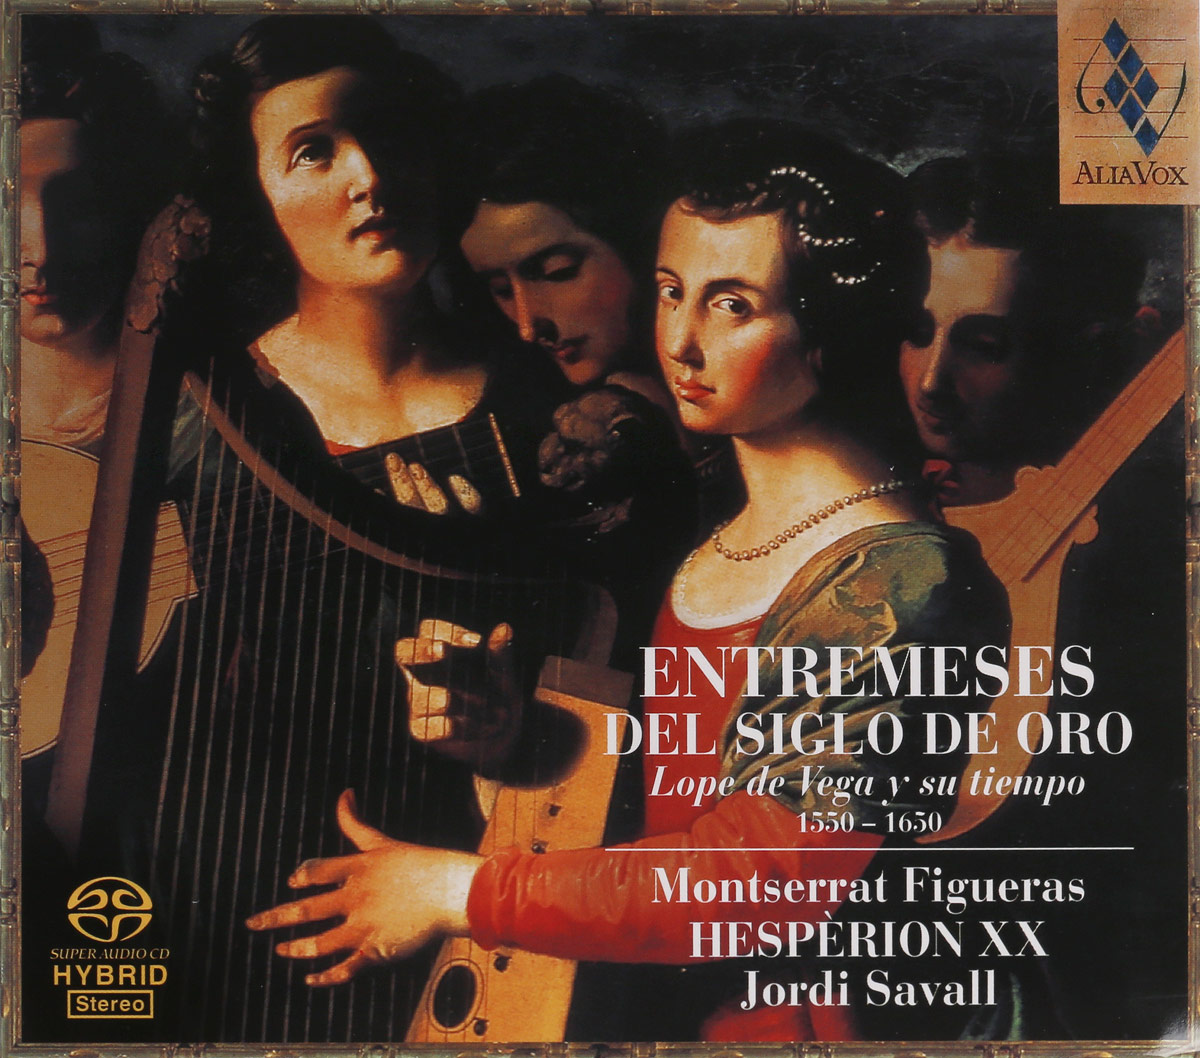 SAVALL, JORDI; MONSERRAT FIGUERAS; HESPERION XX. LOPE DE VEGA Y SU TIEMPO (1550-1650). 1 tiempo muerto